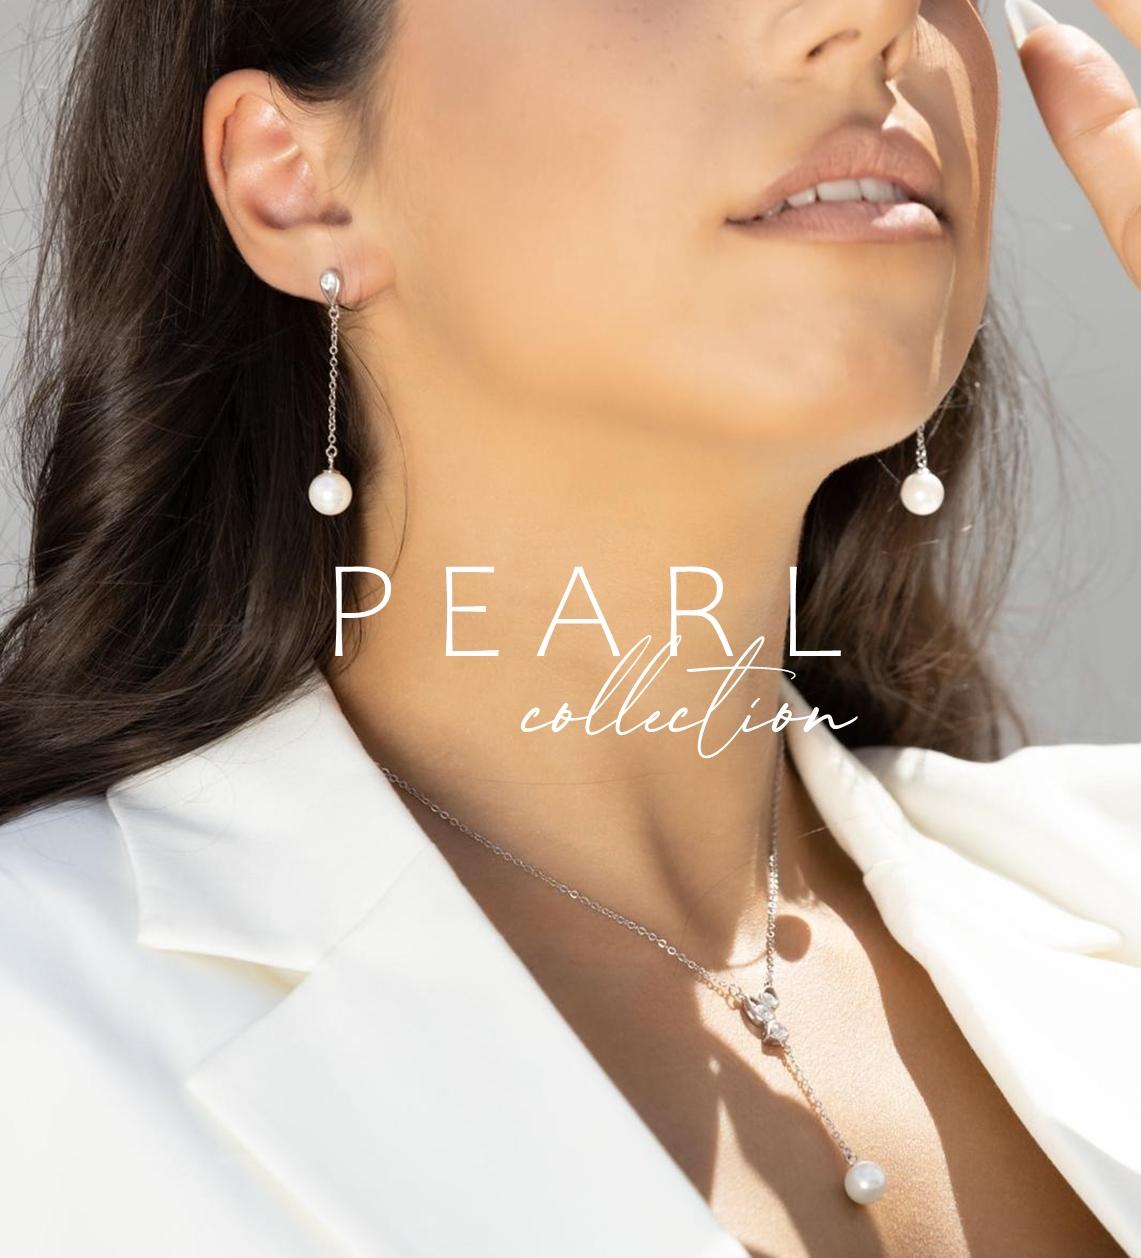 pearlcoll